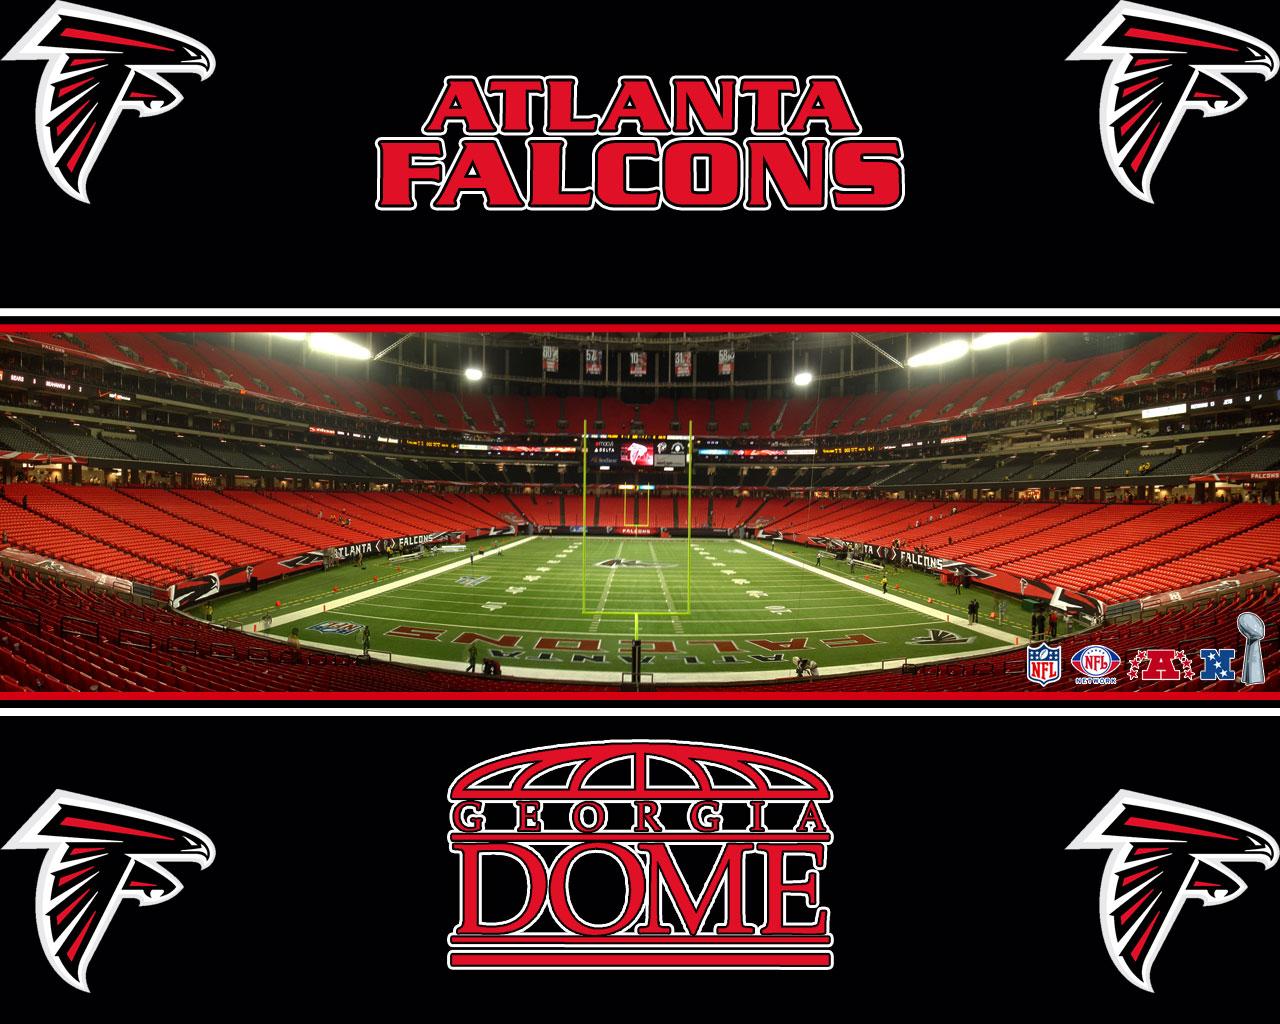 Atlanta Falcons Iphone Wallpaper: Trends Image: Atlanta Falcons Images